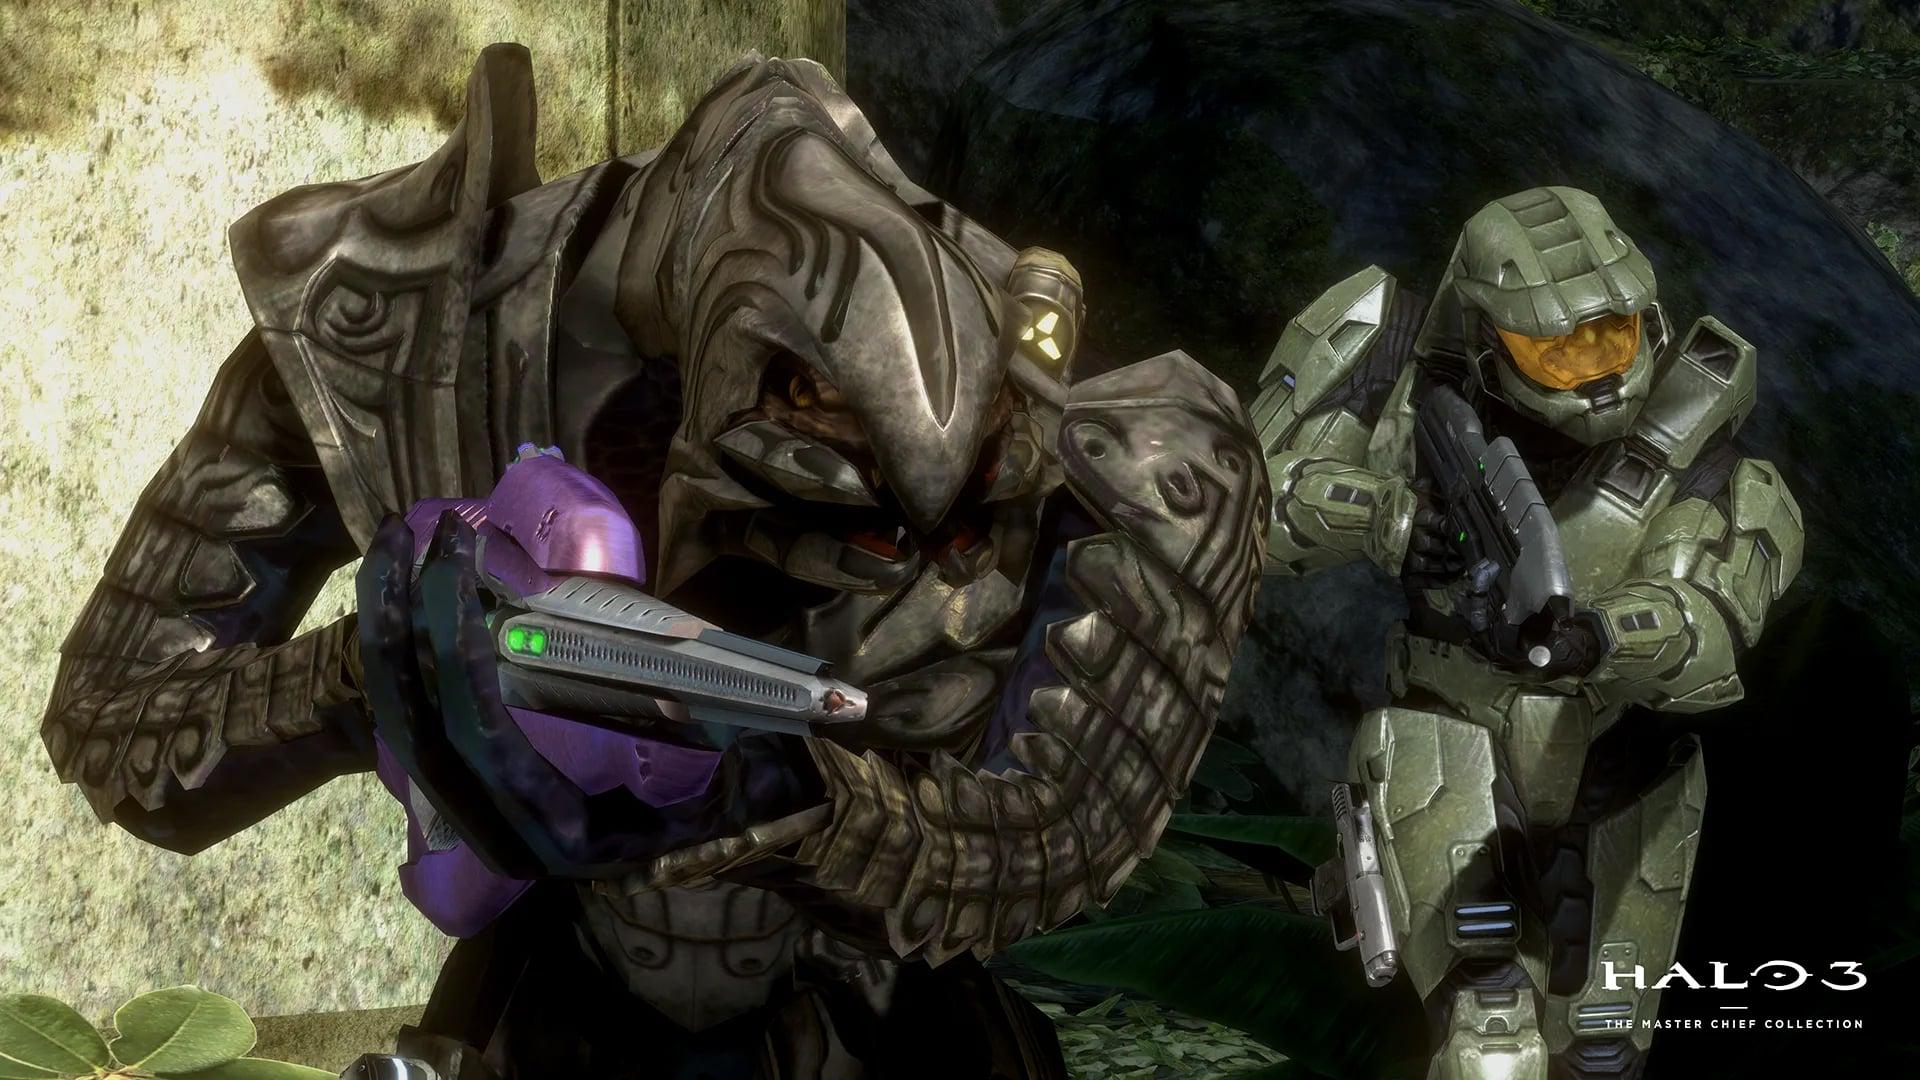 Halo Arbiter impact on franchise game design narrative storytelling religion themes character development Halo 2 Halo 5 343 Industries Bungie Halo 3